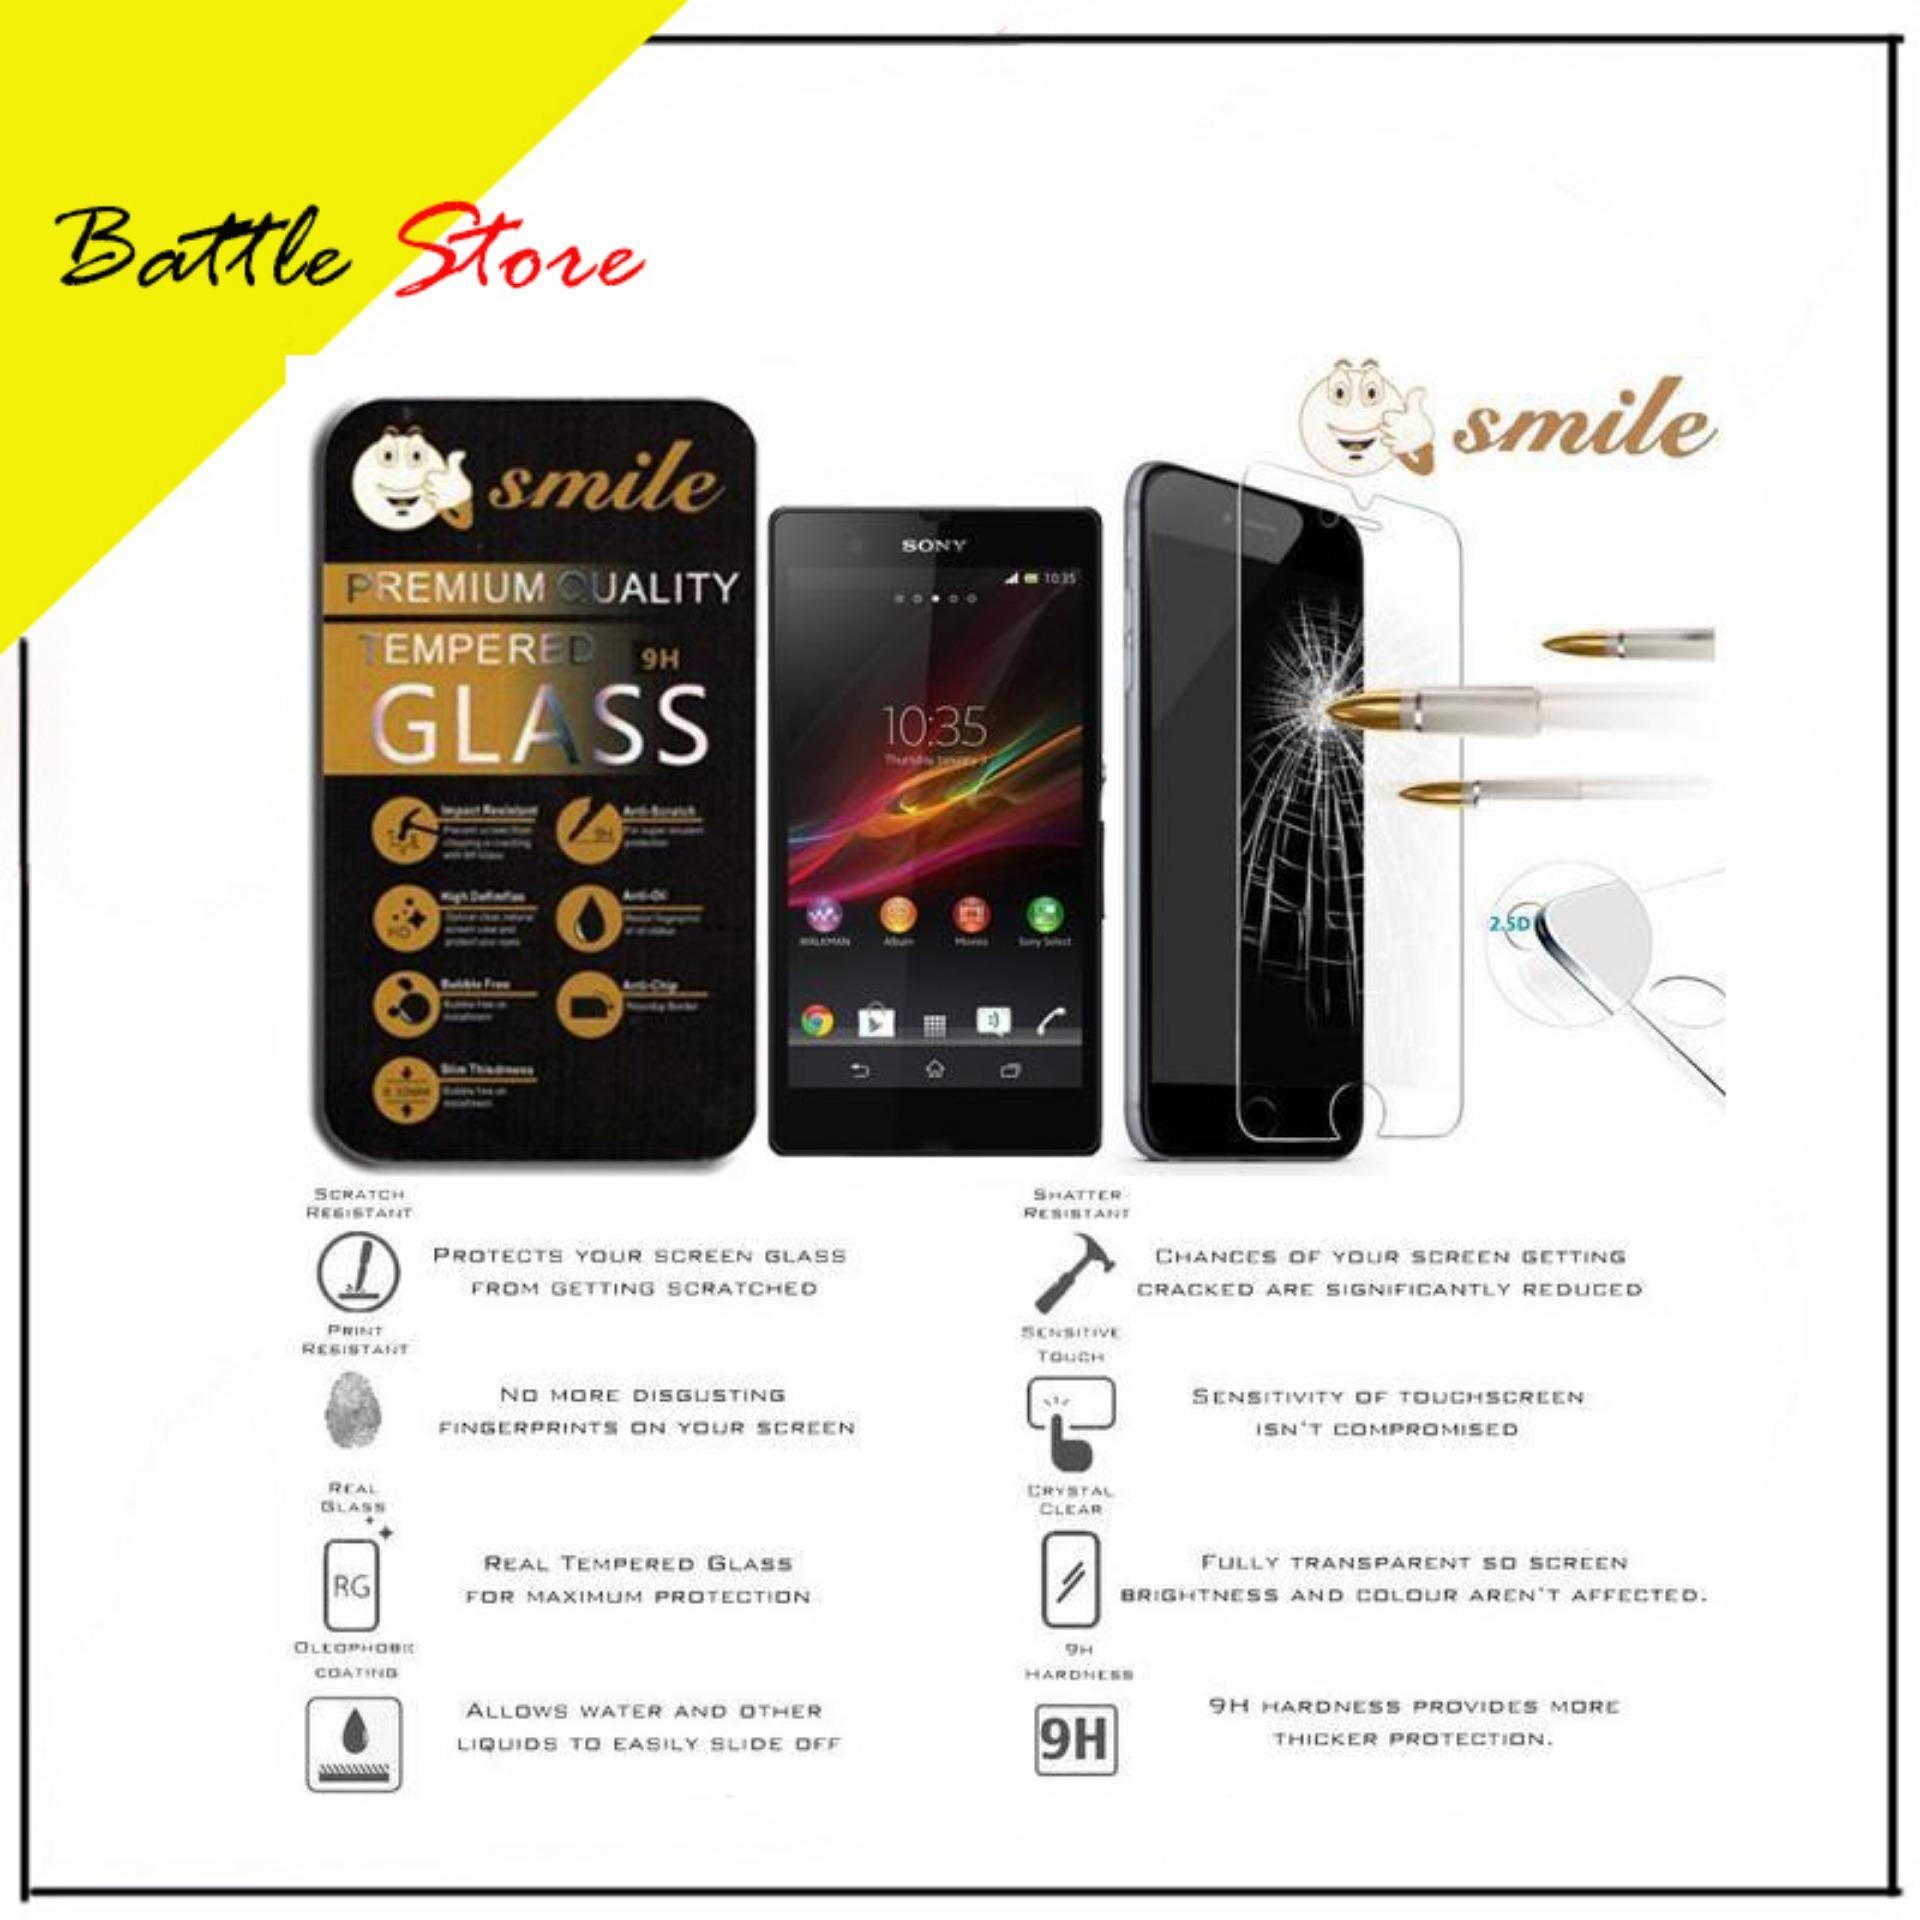 Gambar Produk Rinci Smartfren Andromax Q 4G LTE Premium Smile Screen Protector Tempered Glass / Anti Gores Kaca - White Clear Terkini